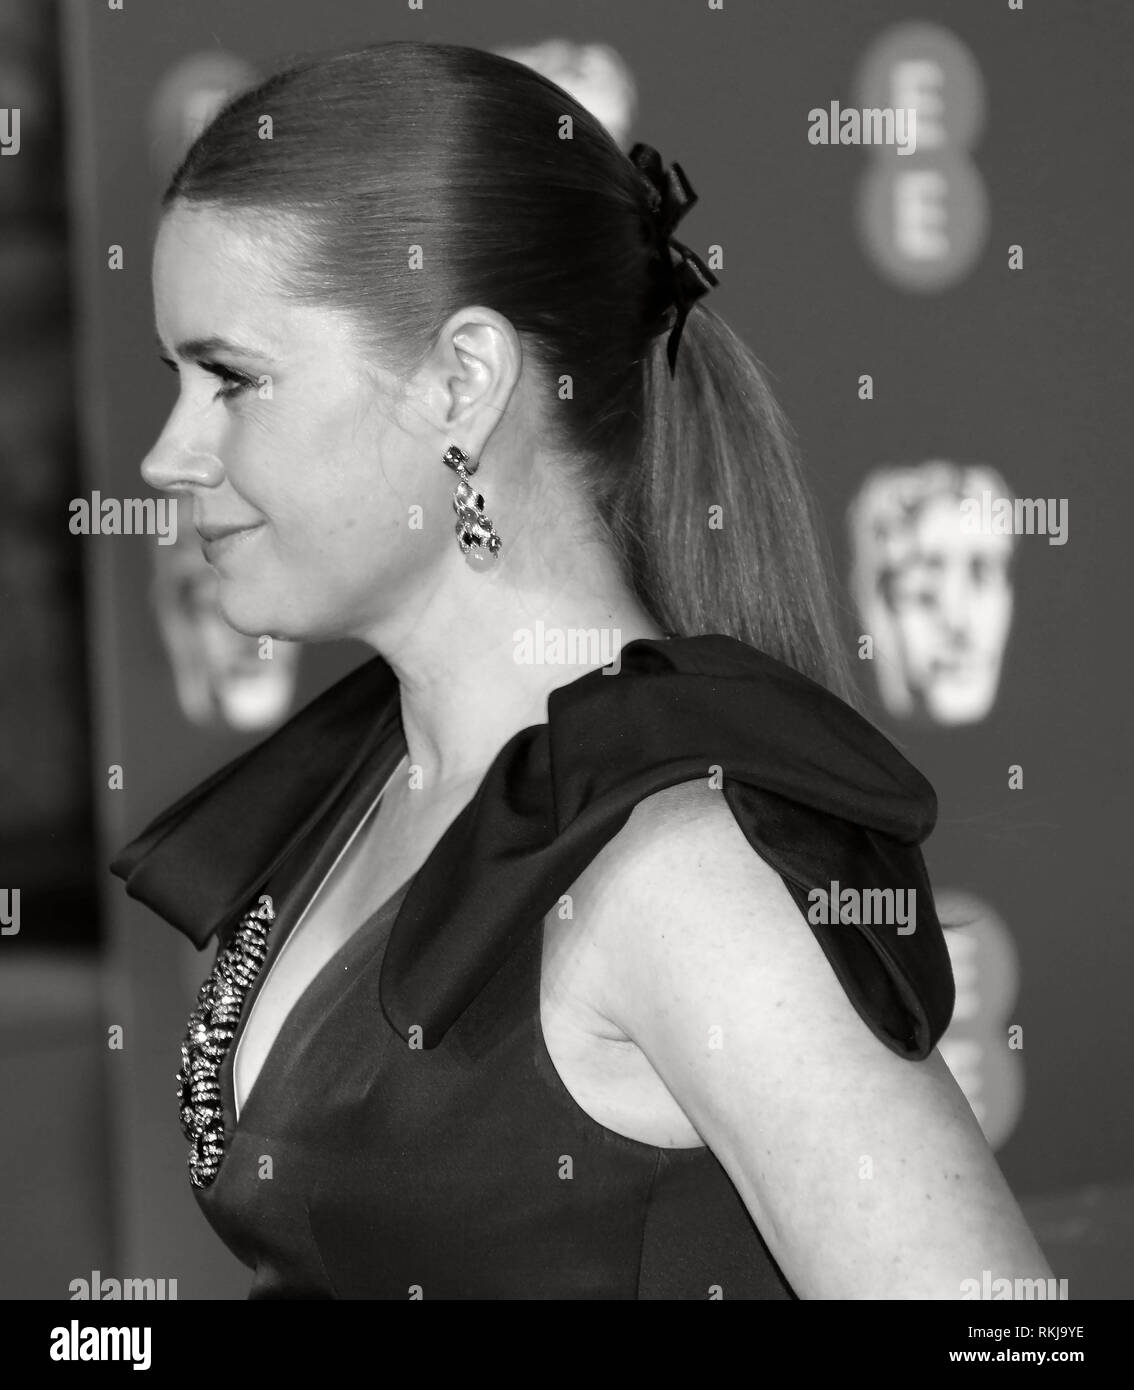 Feb 10, 2019 - Amy Adams an EE British Academy Film Awards 2019 - Alternative Ansicht, der Royal Albert Hall in London, Großbritannien Stockbild